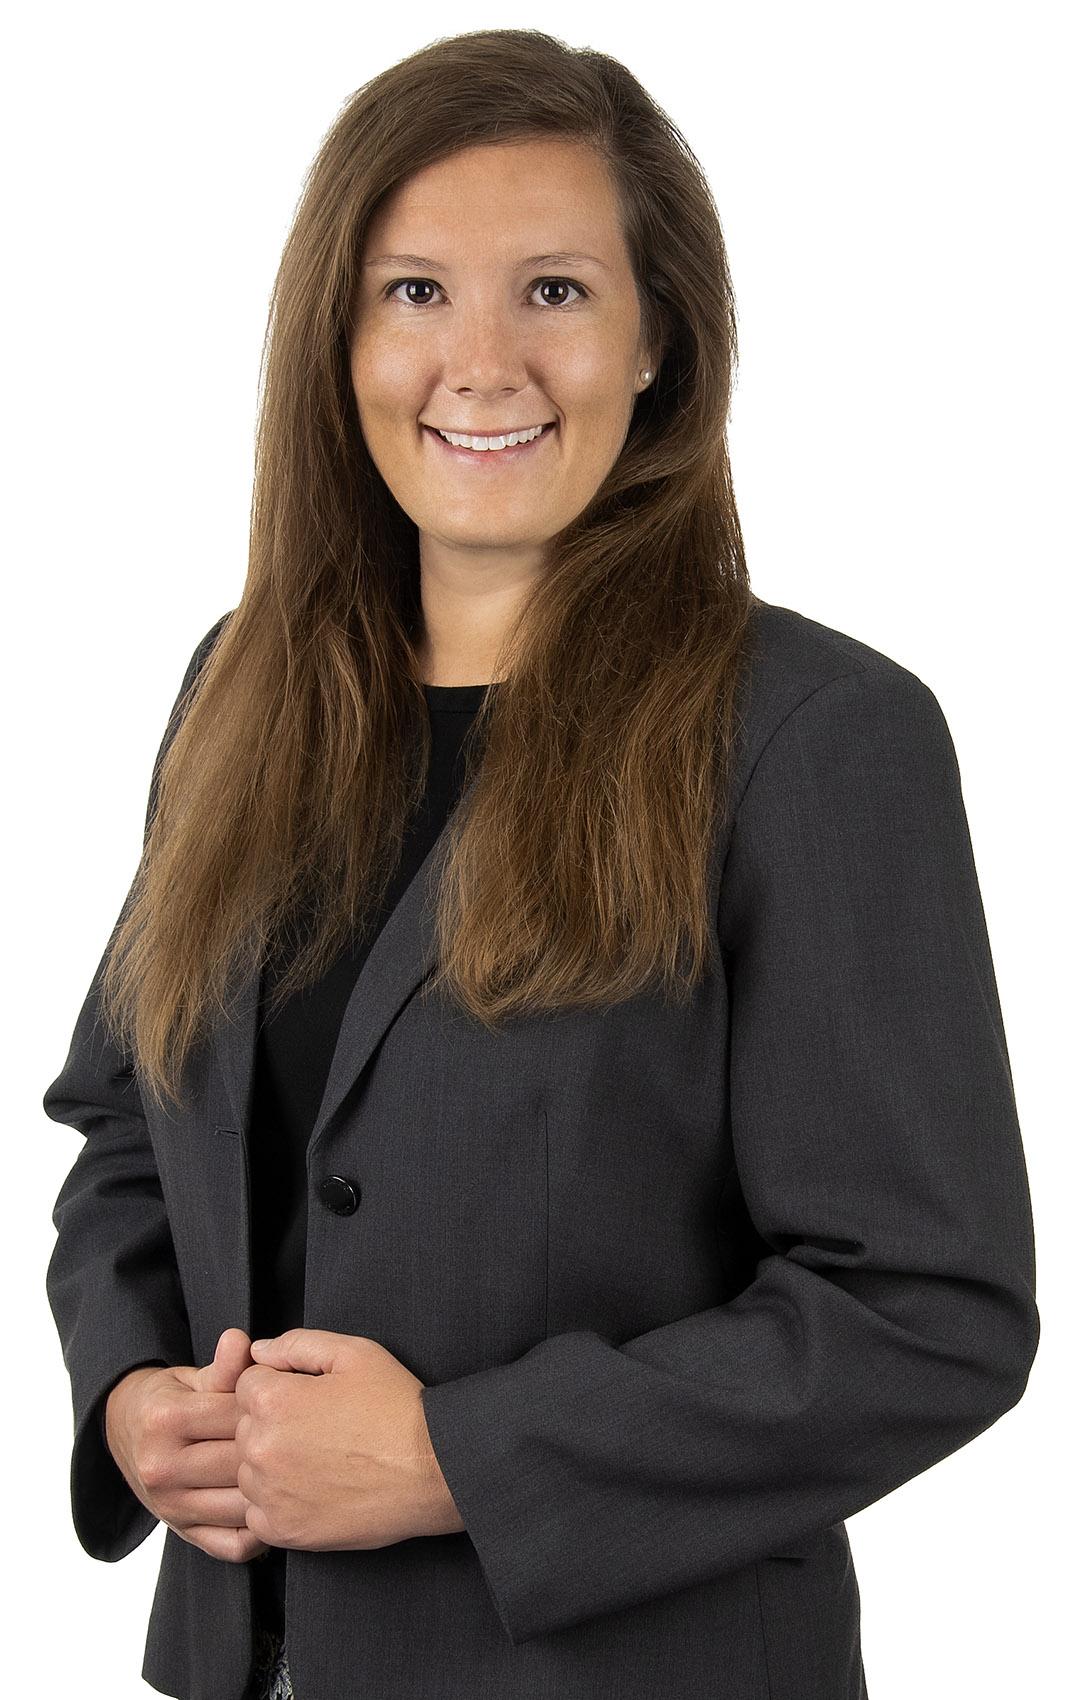 Kacey Diane Heekin